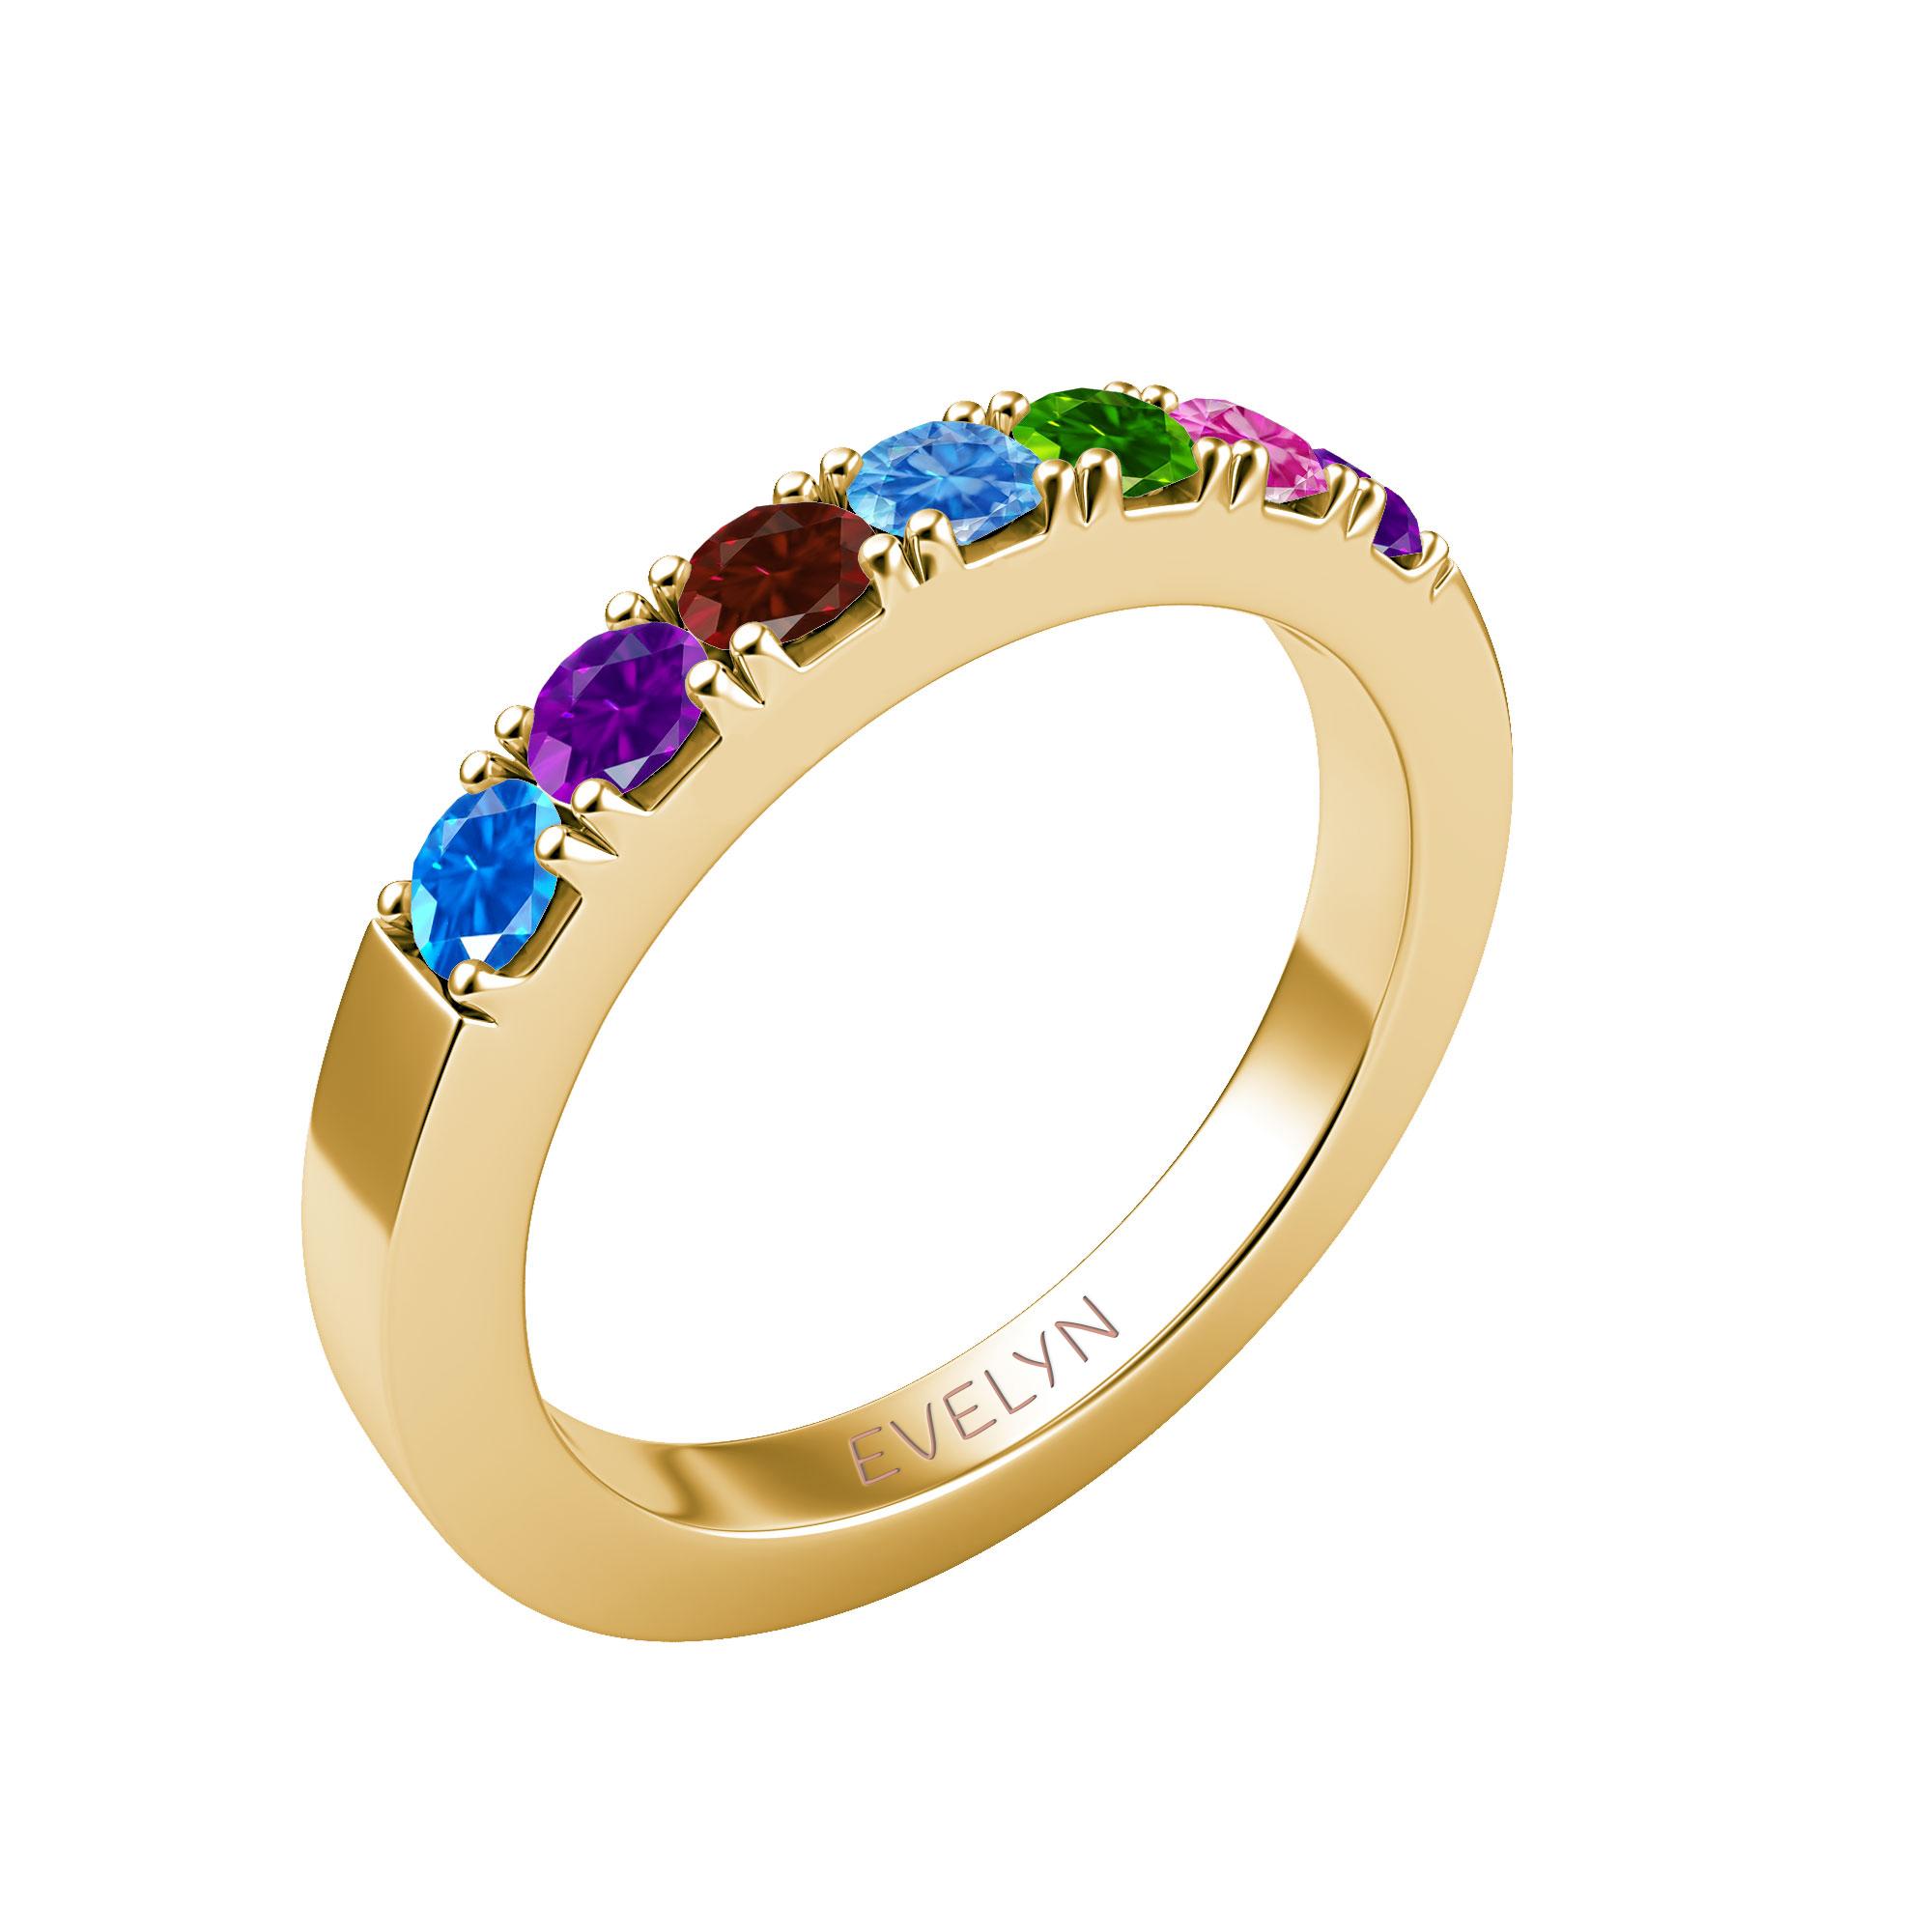 Mother's Custom Birthstone Engravable Family Ring (2-6 Gemstones)